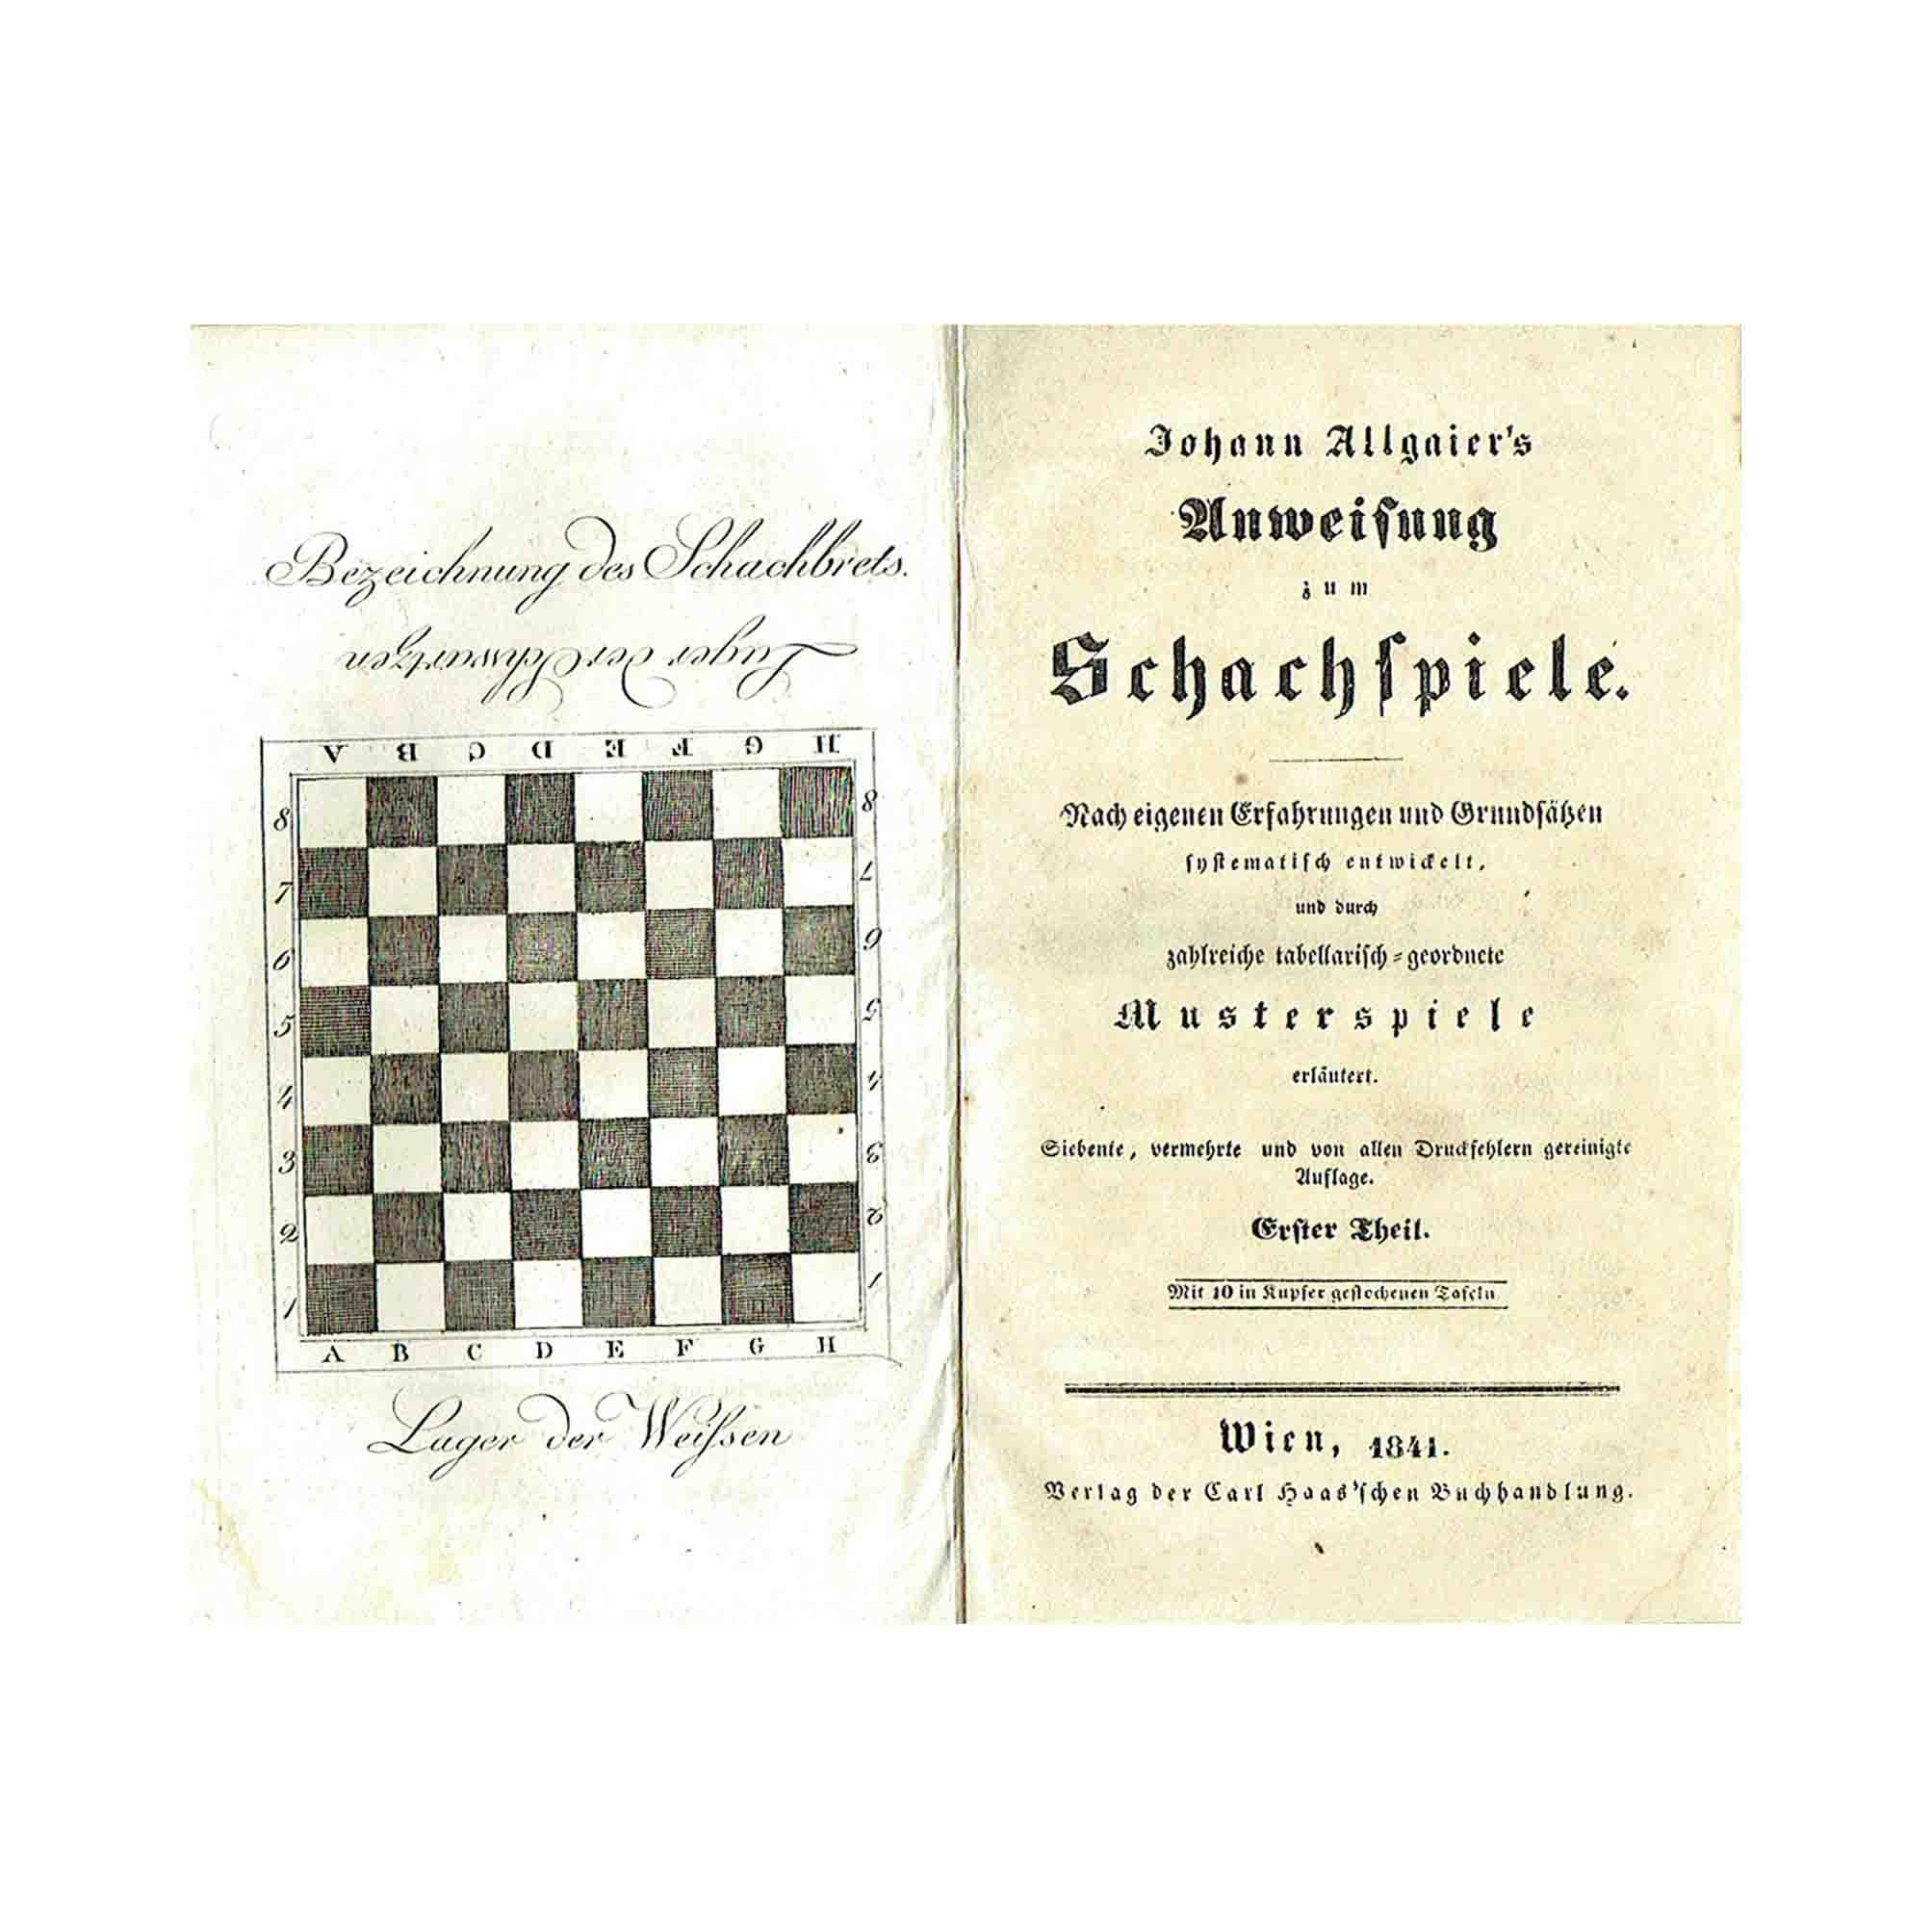 5844-Allgaier-Santo-Vito-Schach-Chess-1841-Frontispiece-Title-A-N.jpg